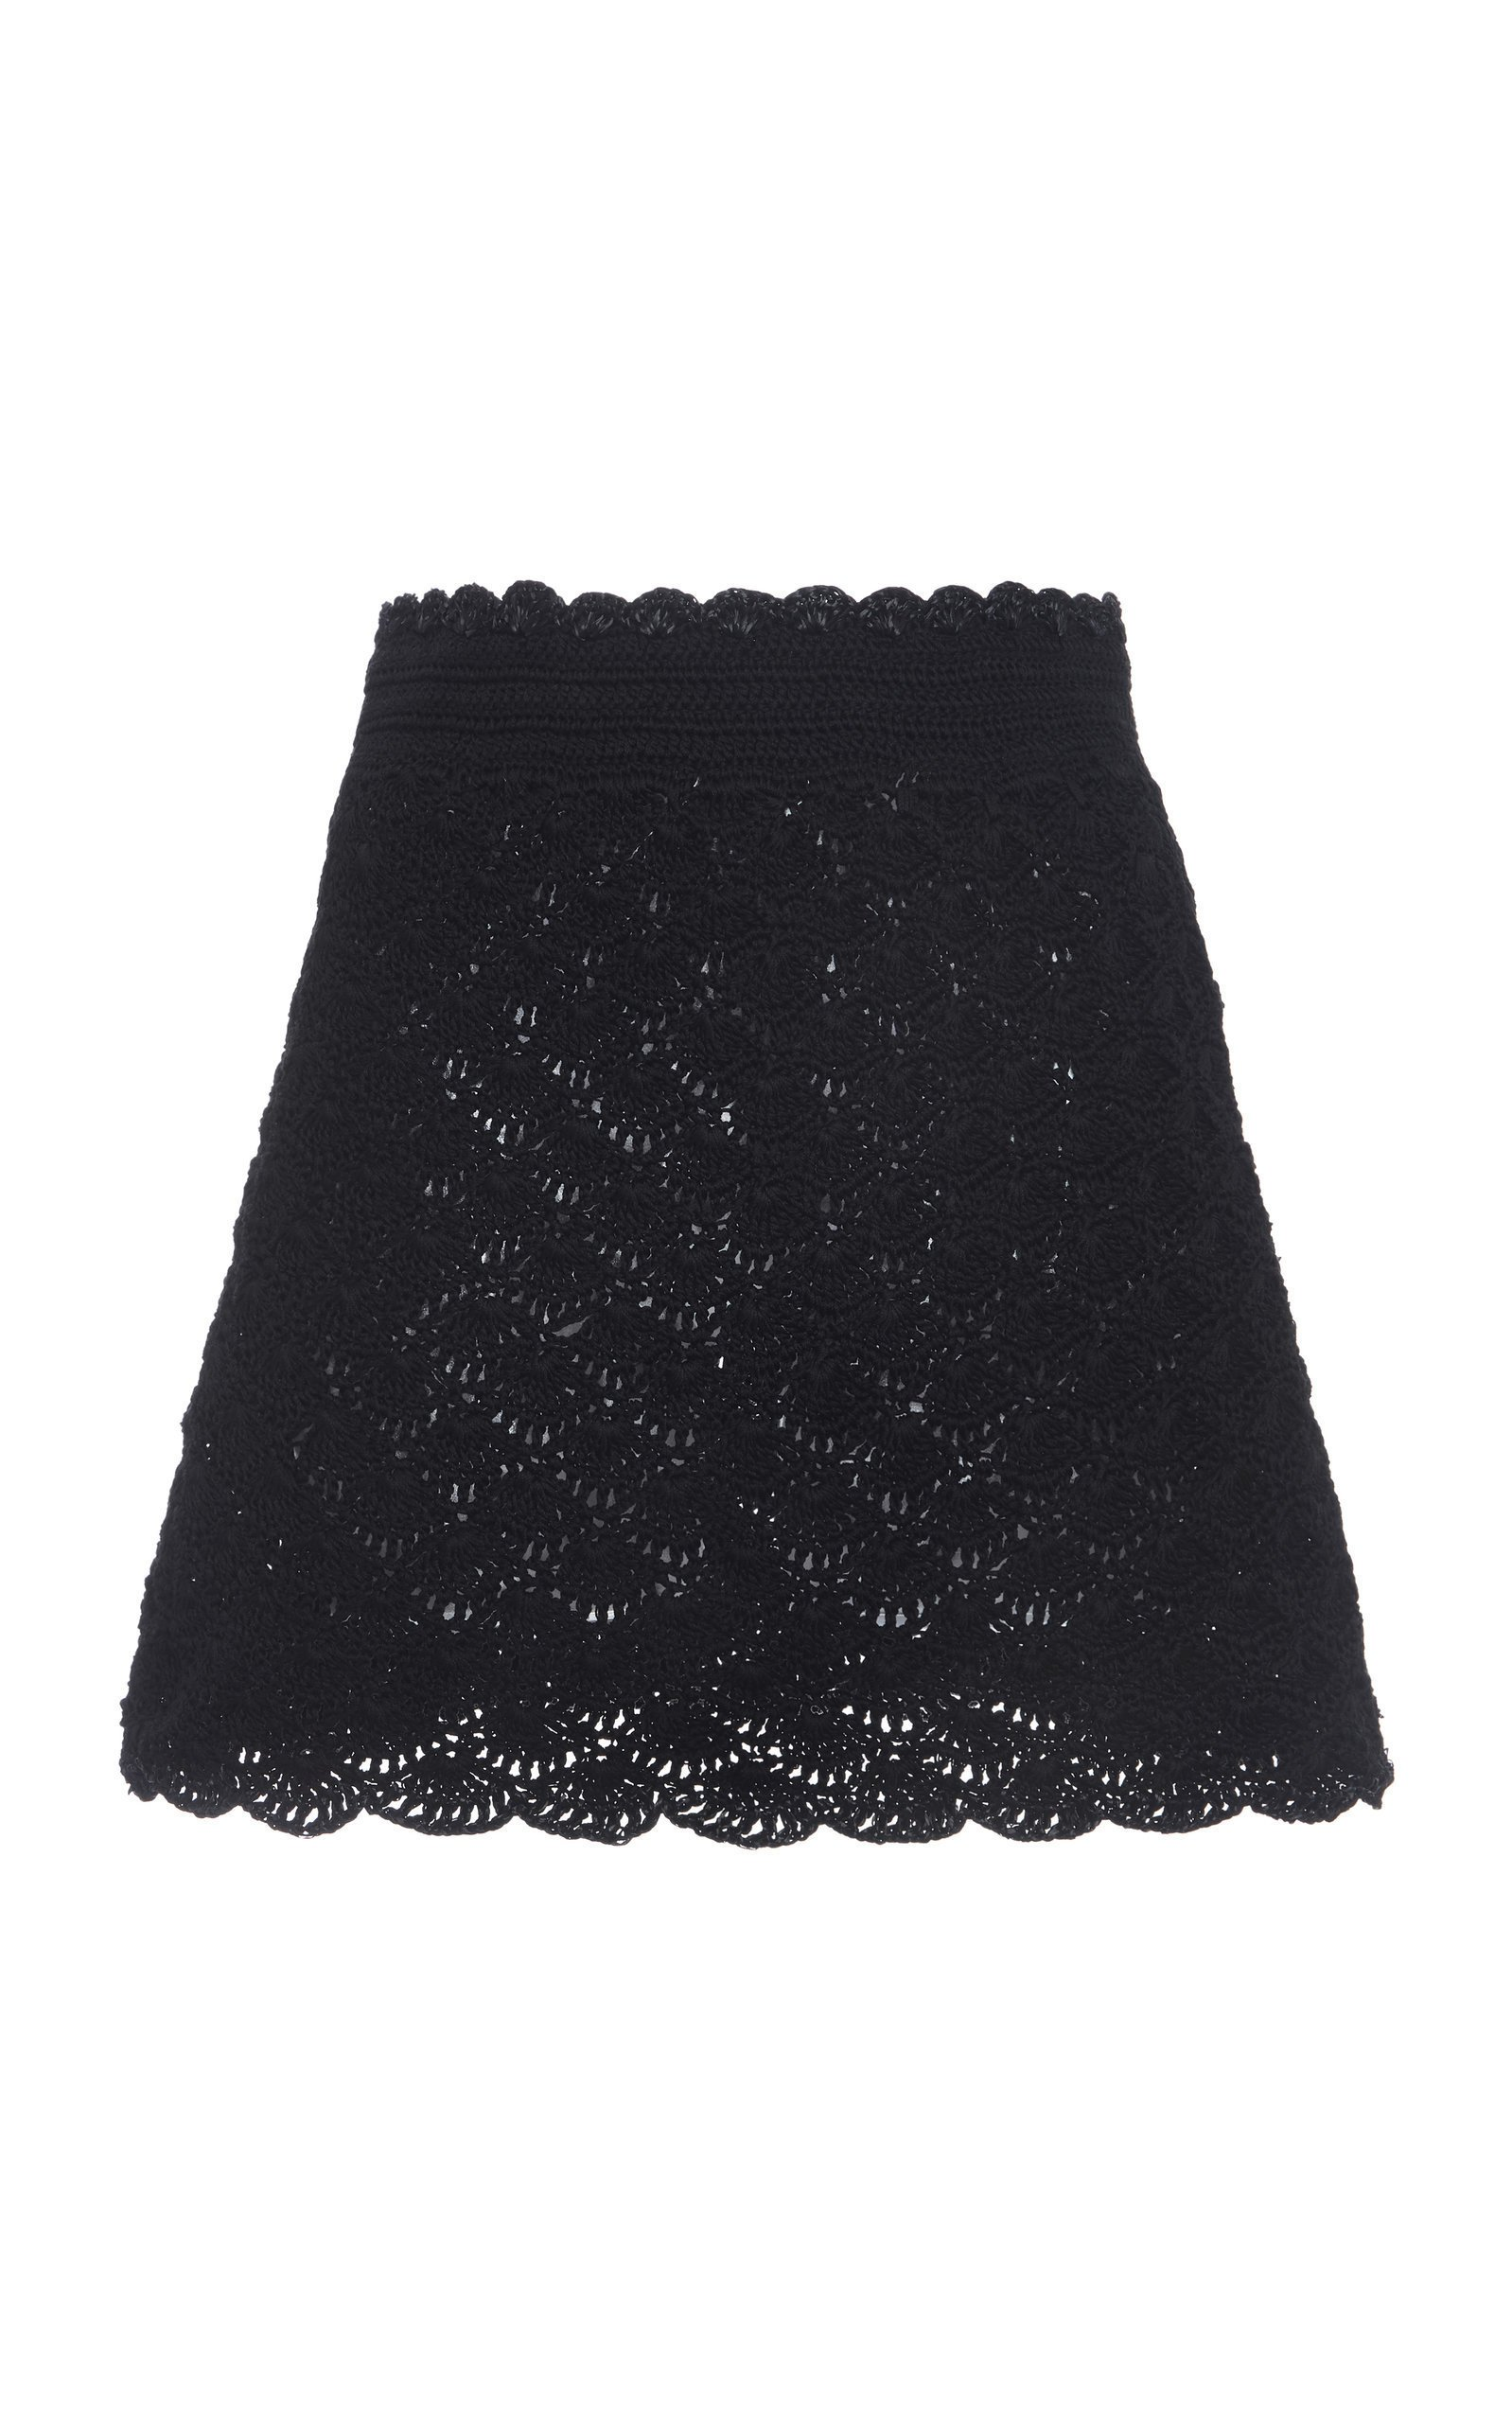 Dolce & Gabbana Crochet-Knit Mini Skirt Size: 46